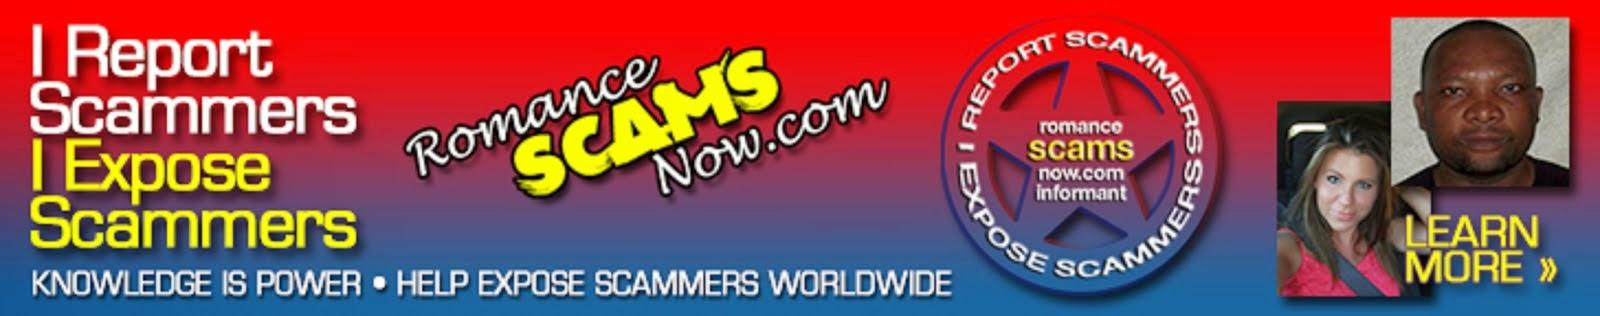 Dating Background Checks - Wymoo International, LLC